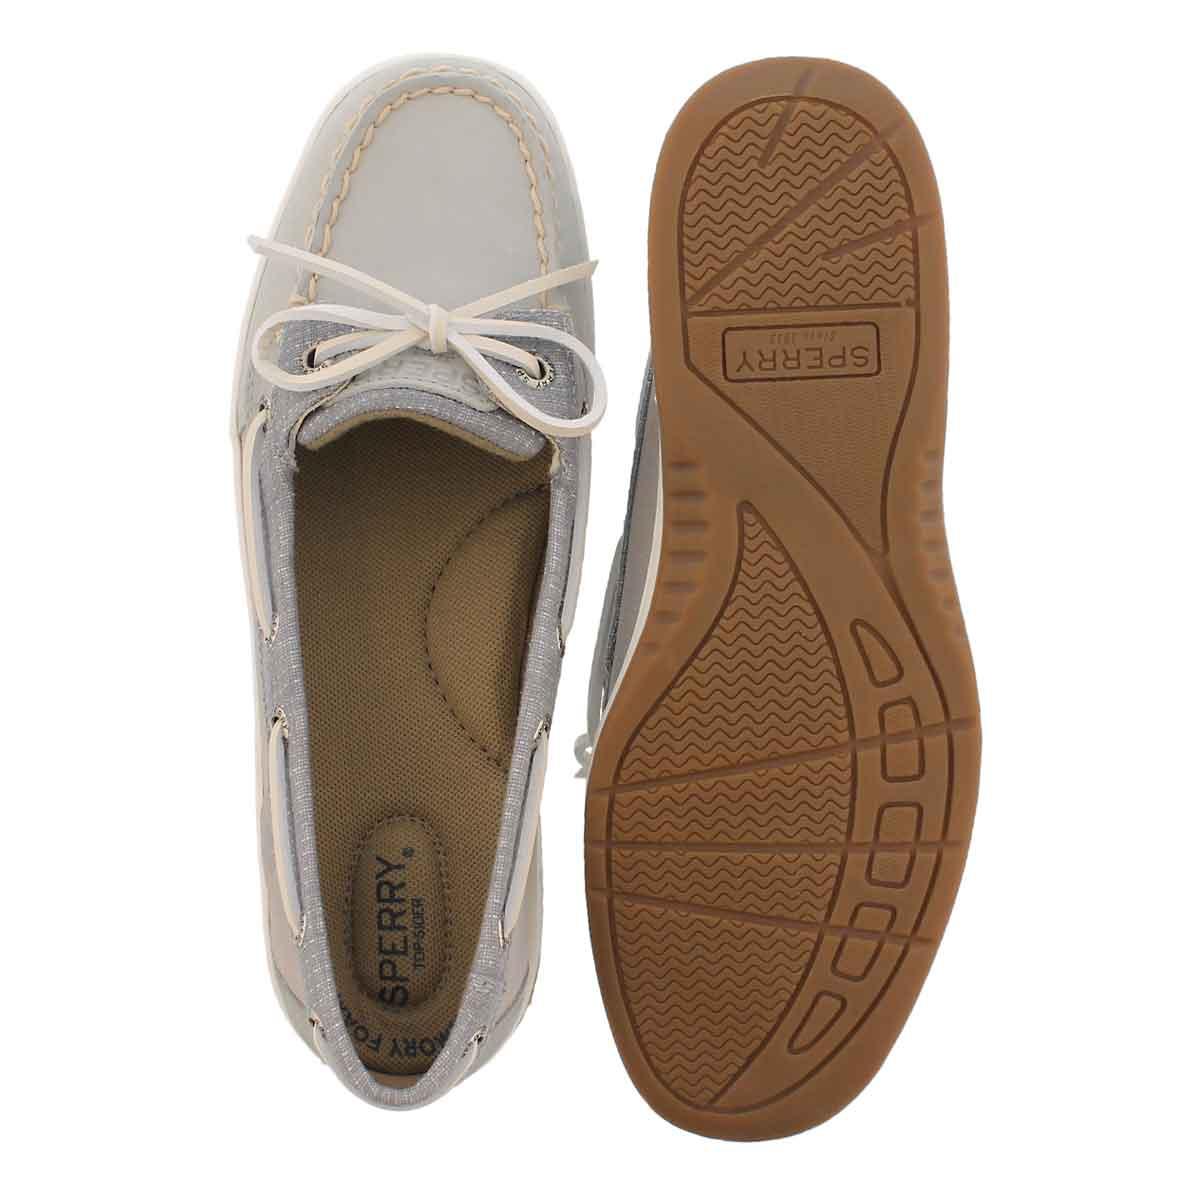 Lds Angelfish Two Tone vapor boat shoe